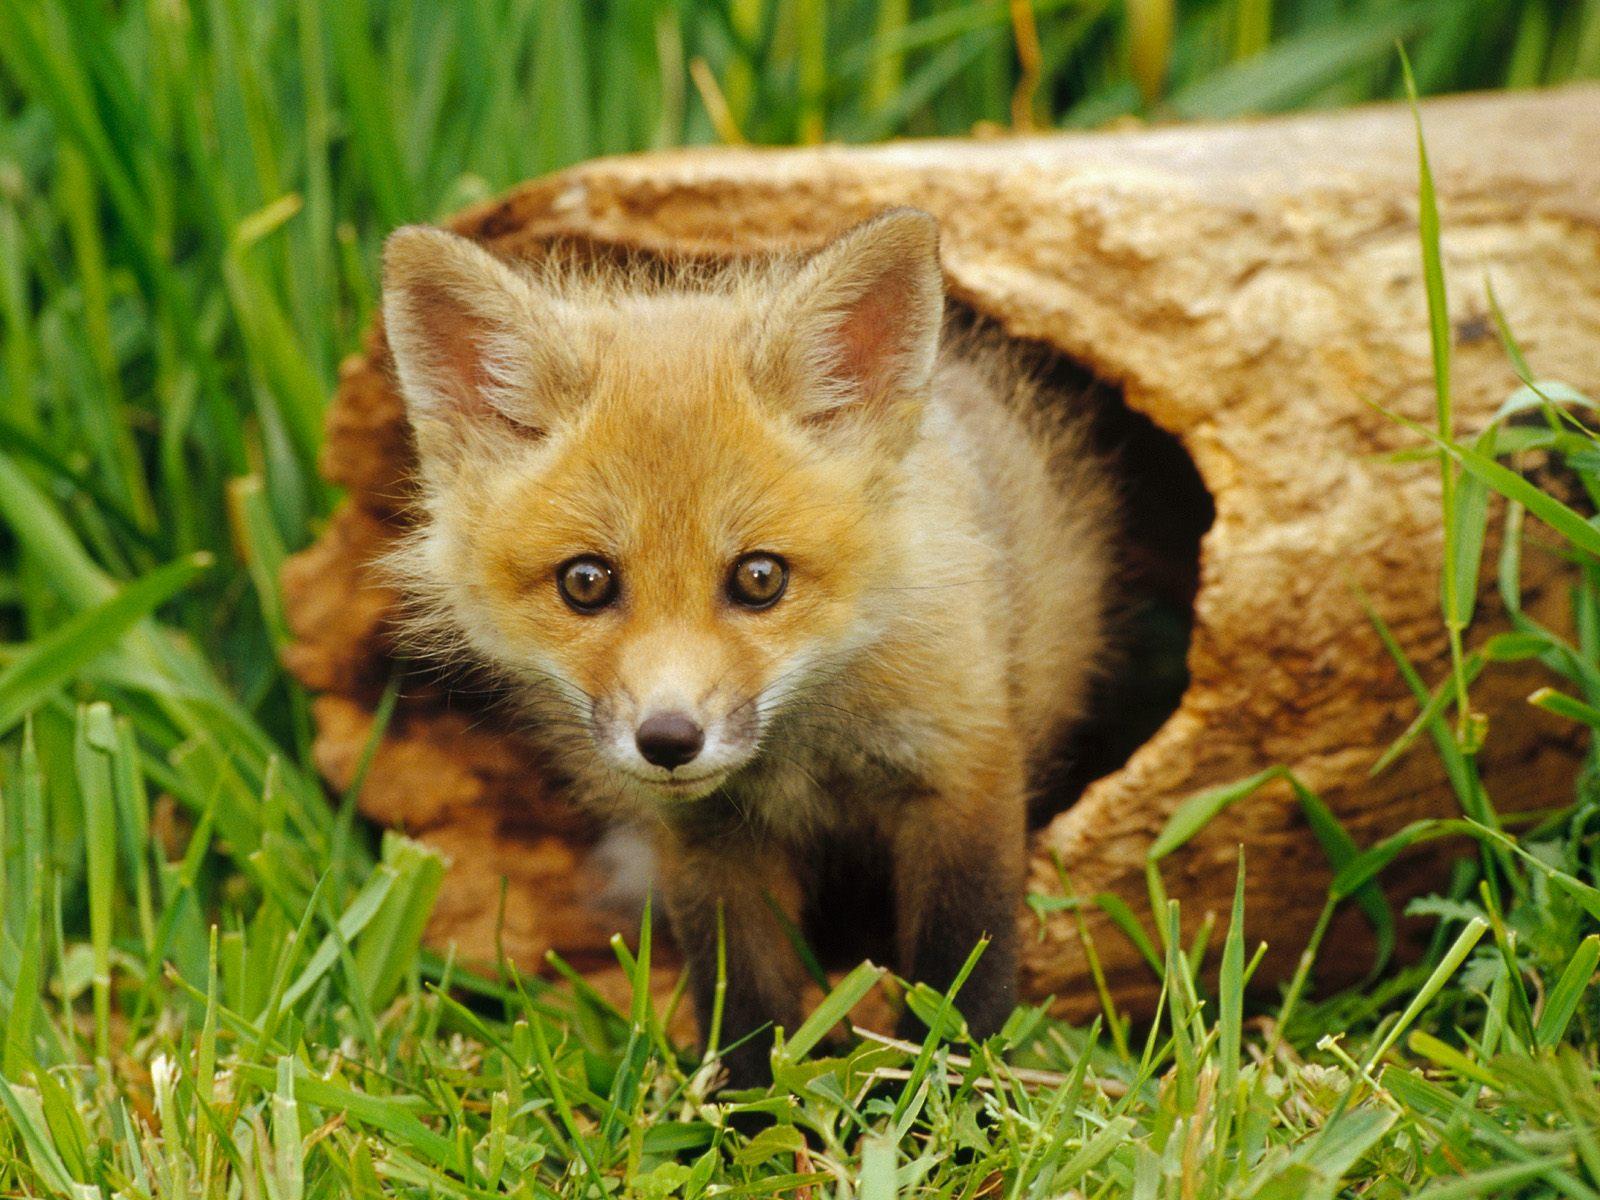 Cute Animal Wallpapers Free: Mix Animal Wallpaper Pack 2 (1600x1200)